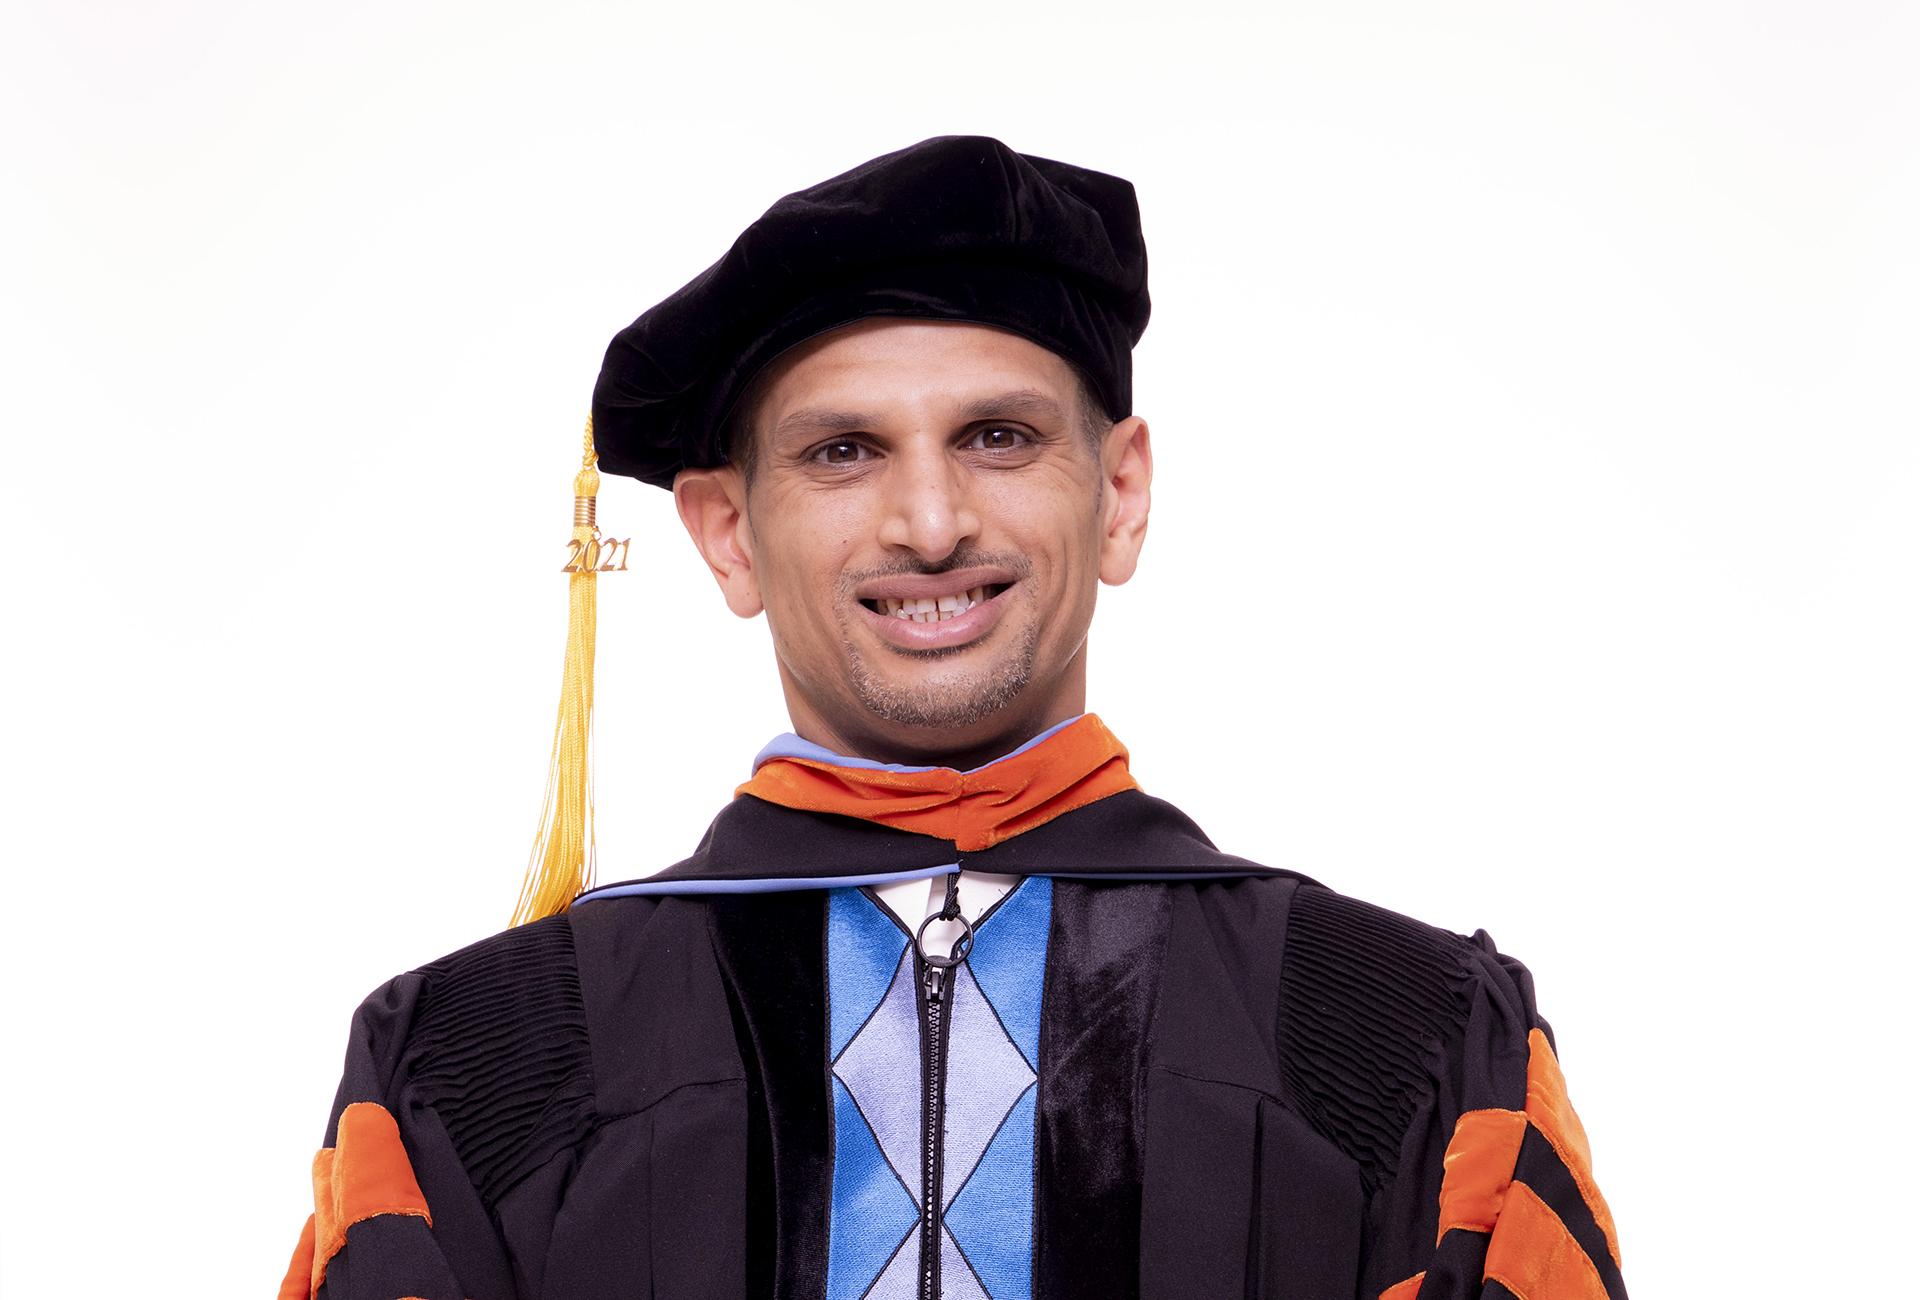 Exclusive Student Interview - Ali Hassan Al-Rashid